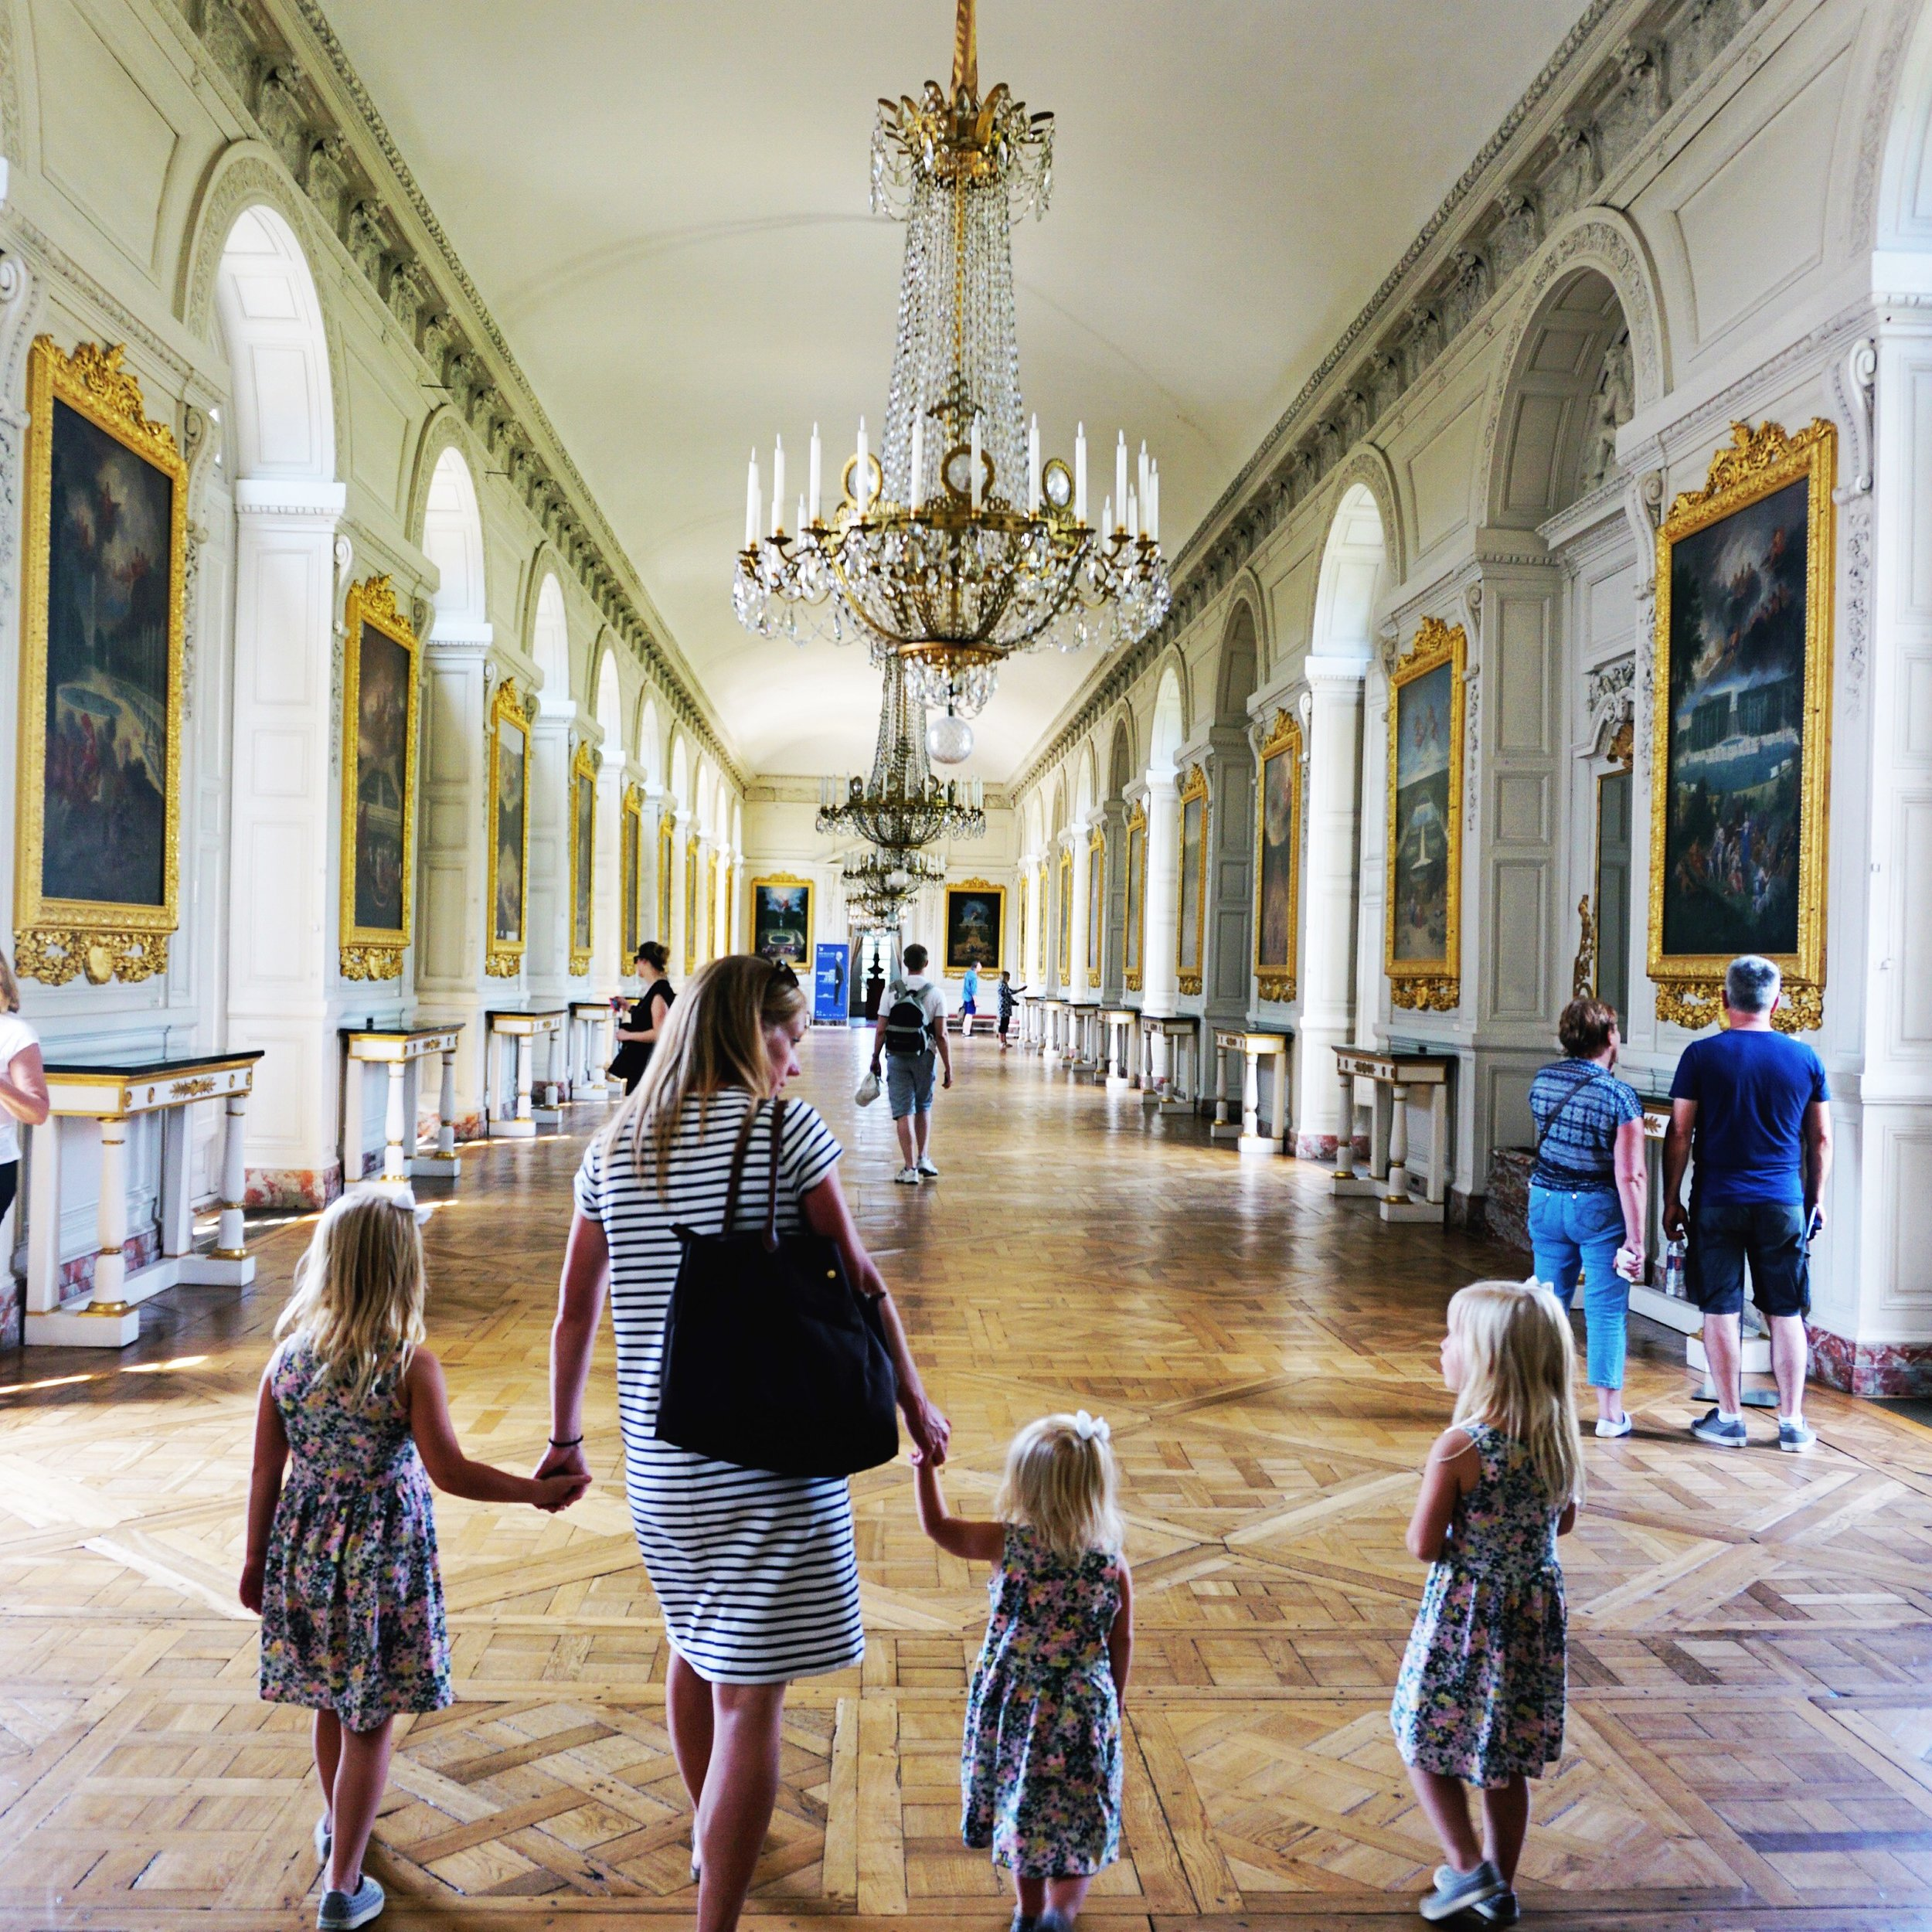 July 2016 at the Palace of Versailles